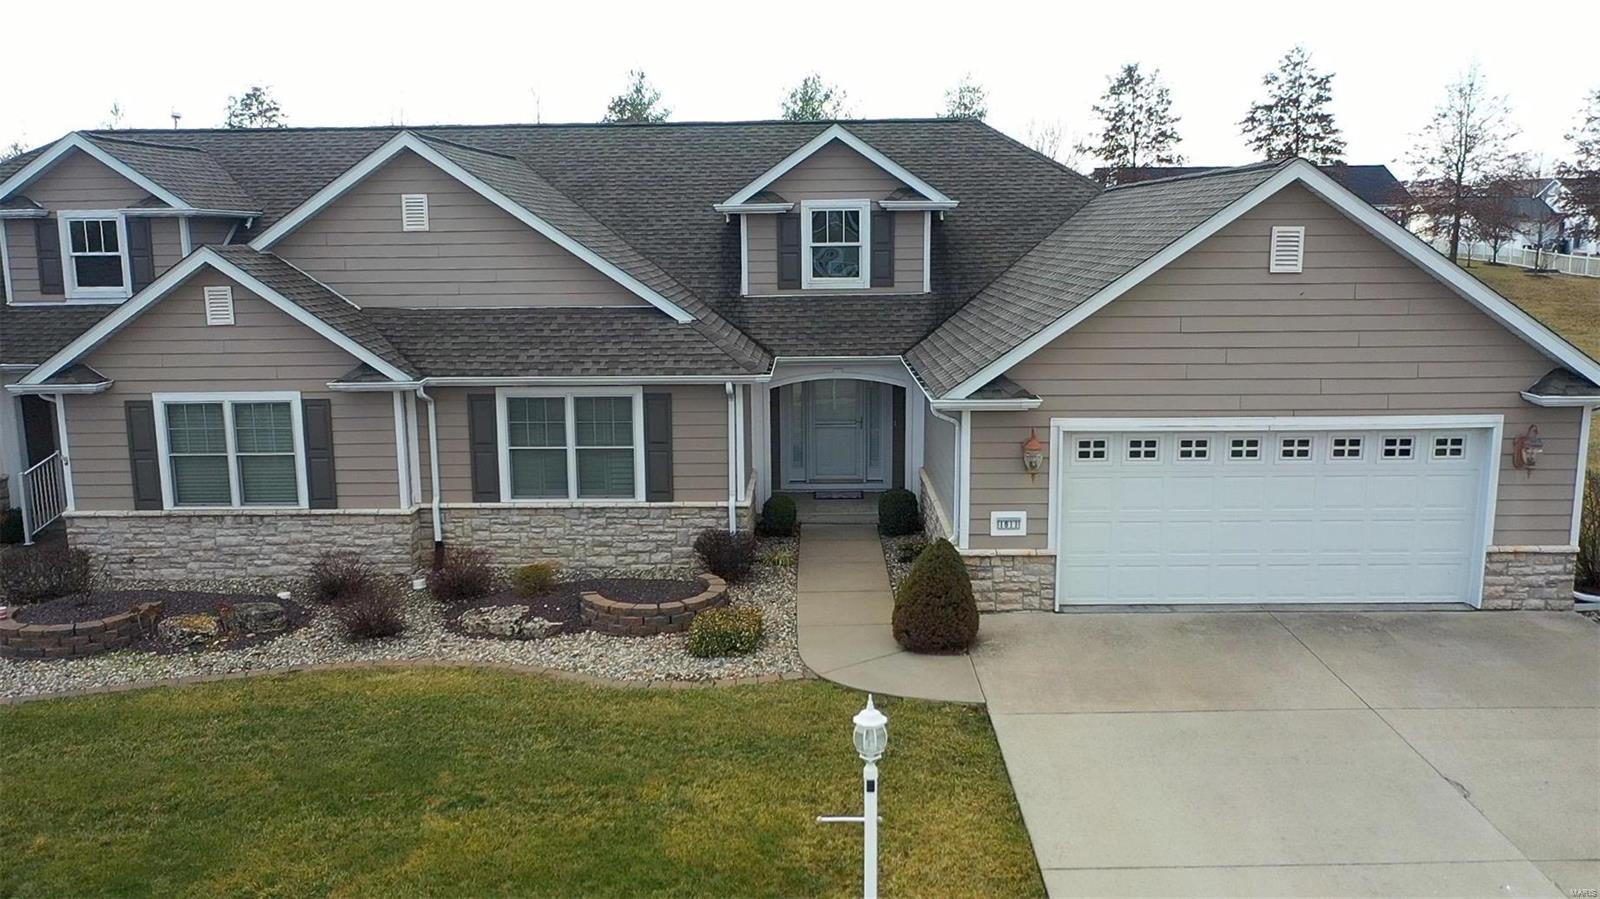 1811 Sycamore Hill Drive #18 Property Photo - Godfrey, IL real estate listing